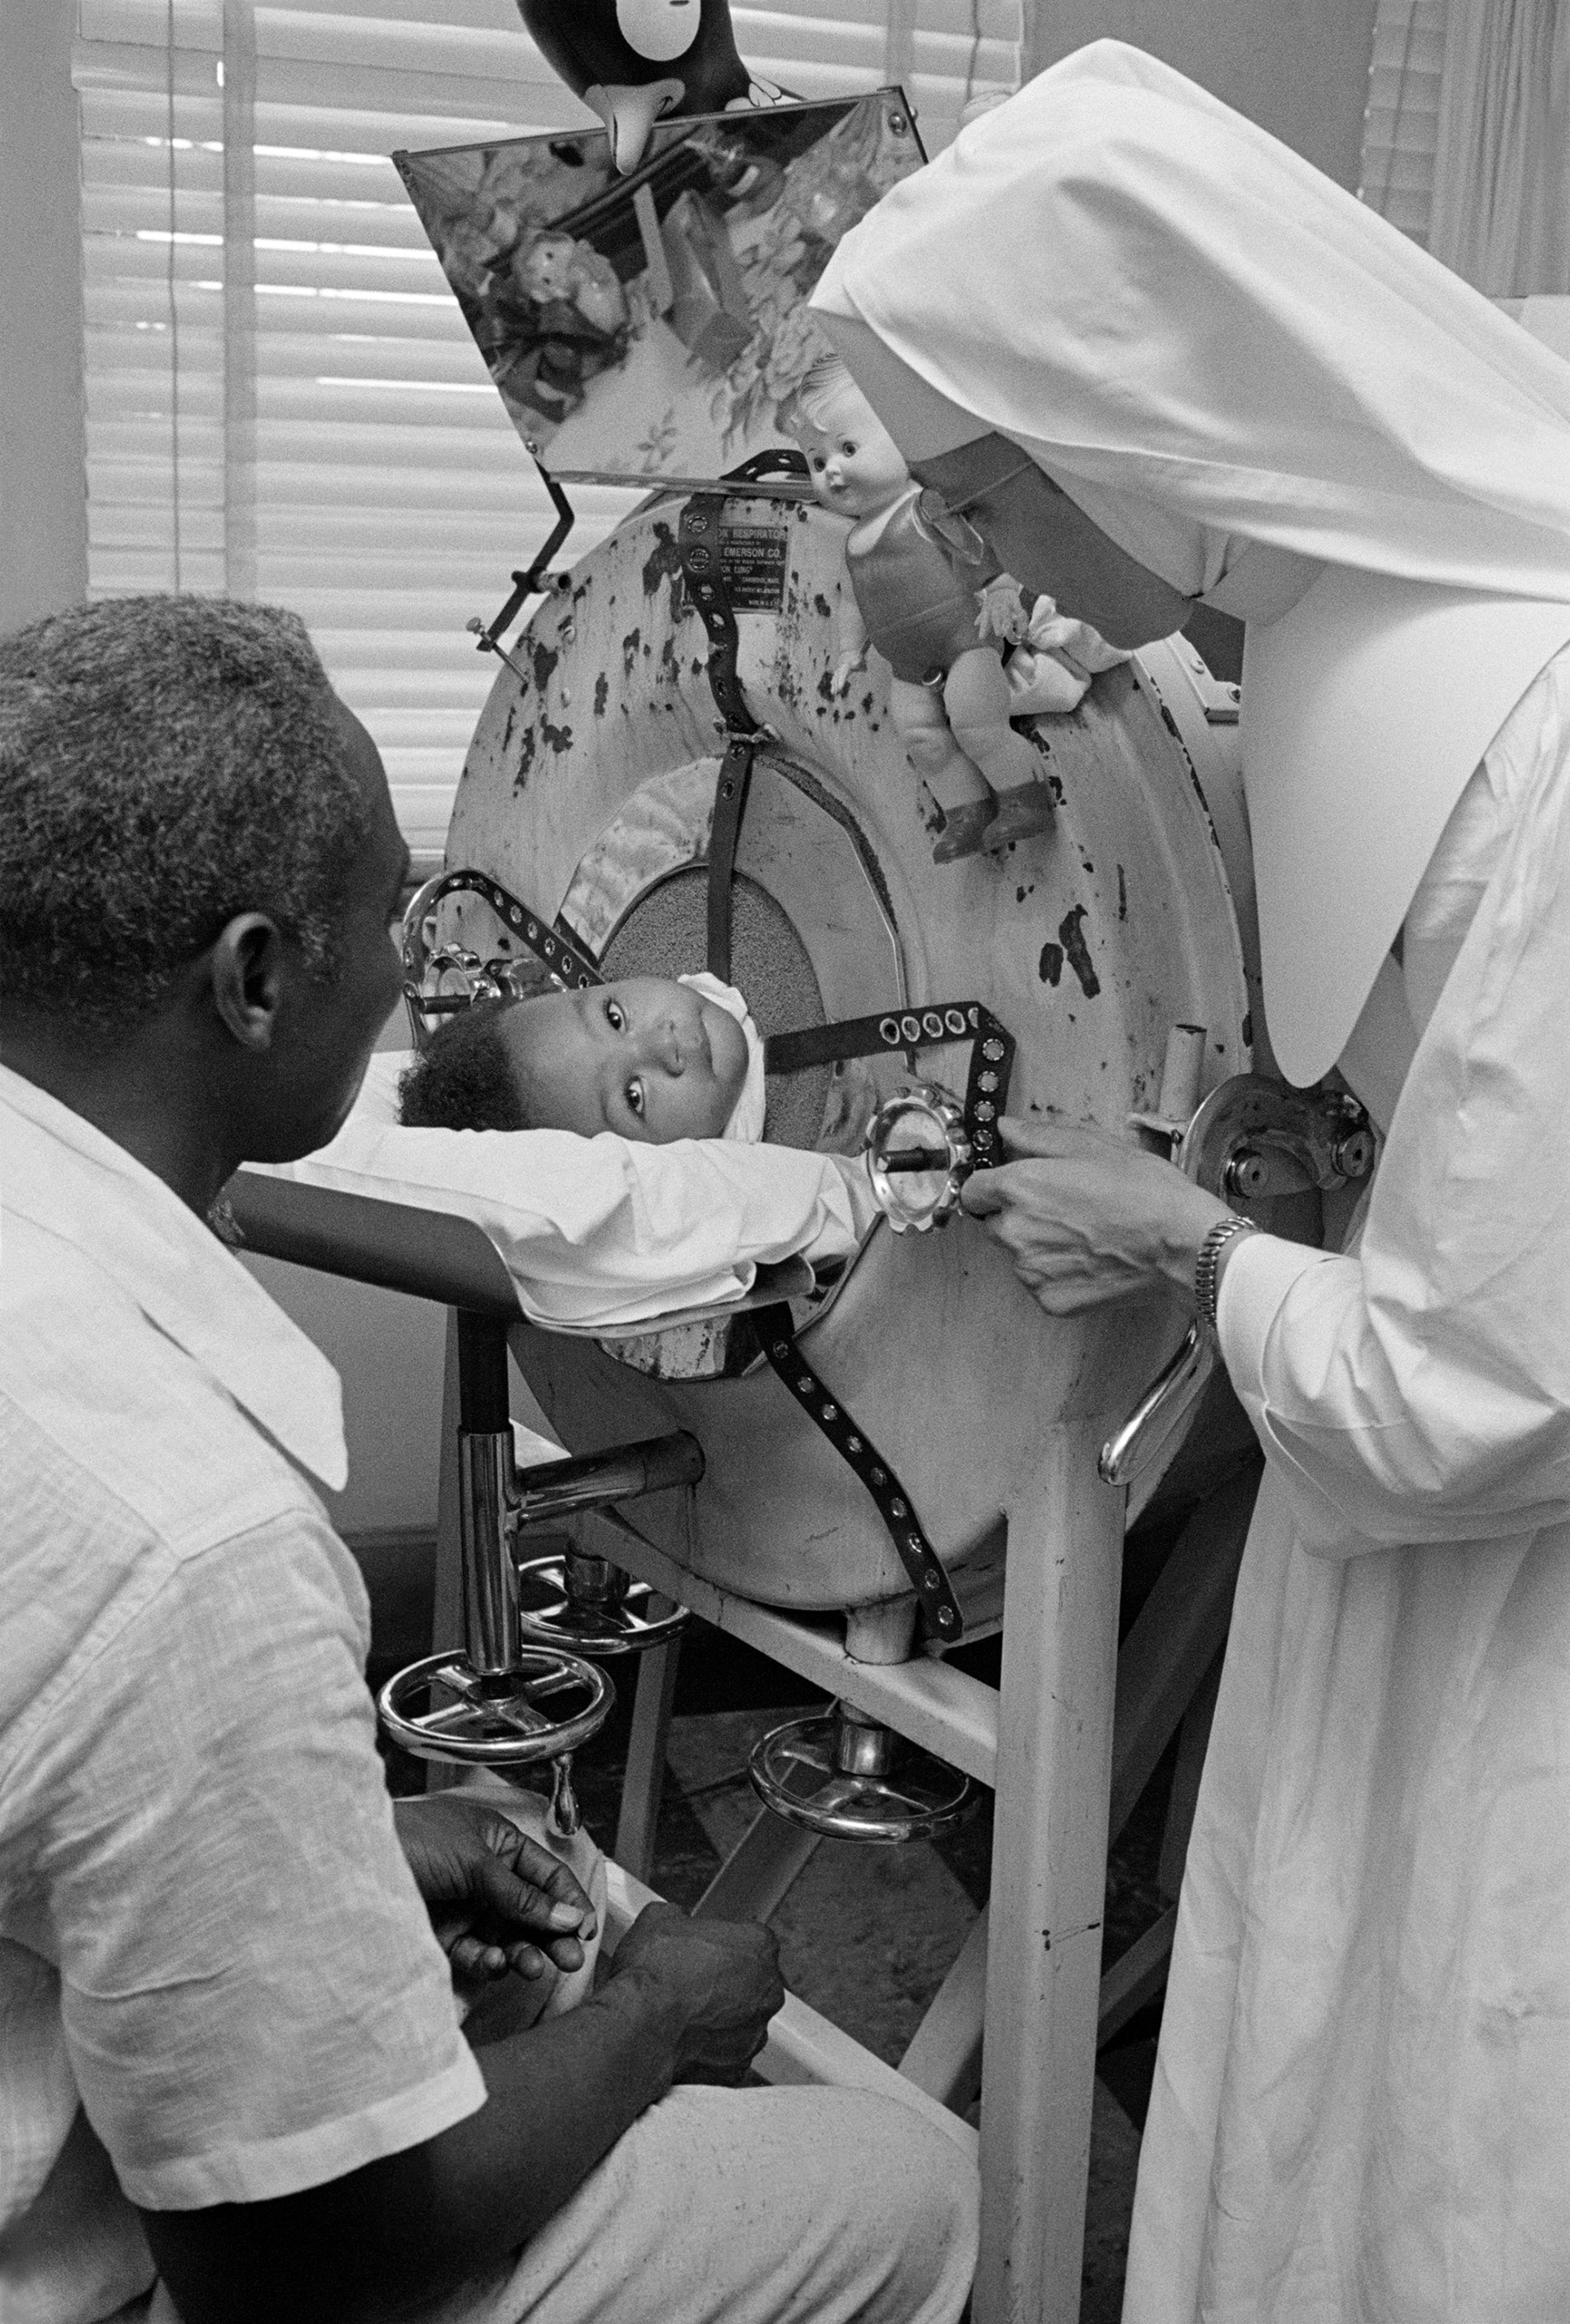 Polio treatment, Montgomery, Alabama, 1953.